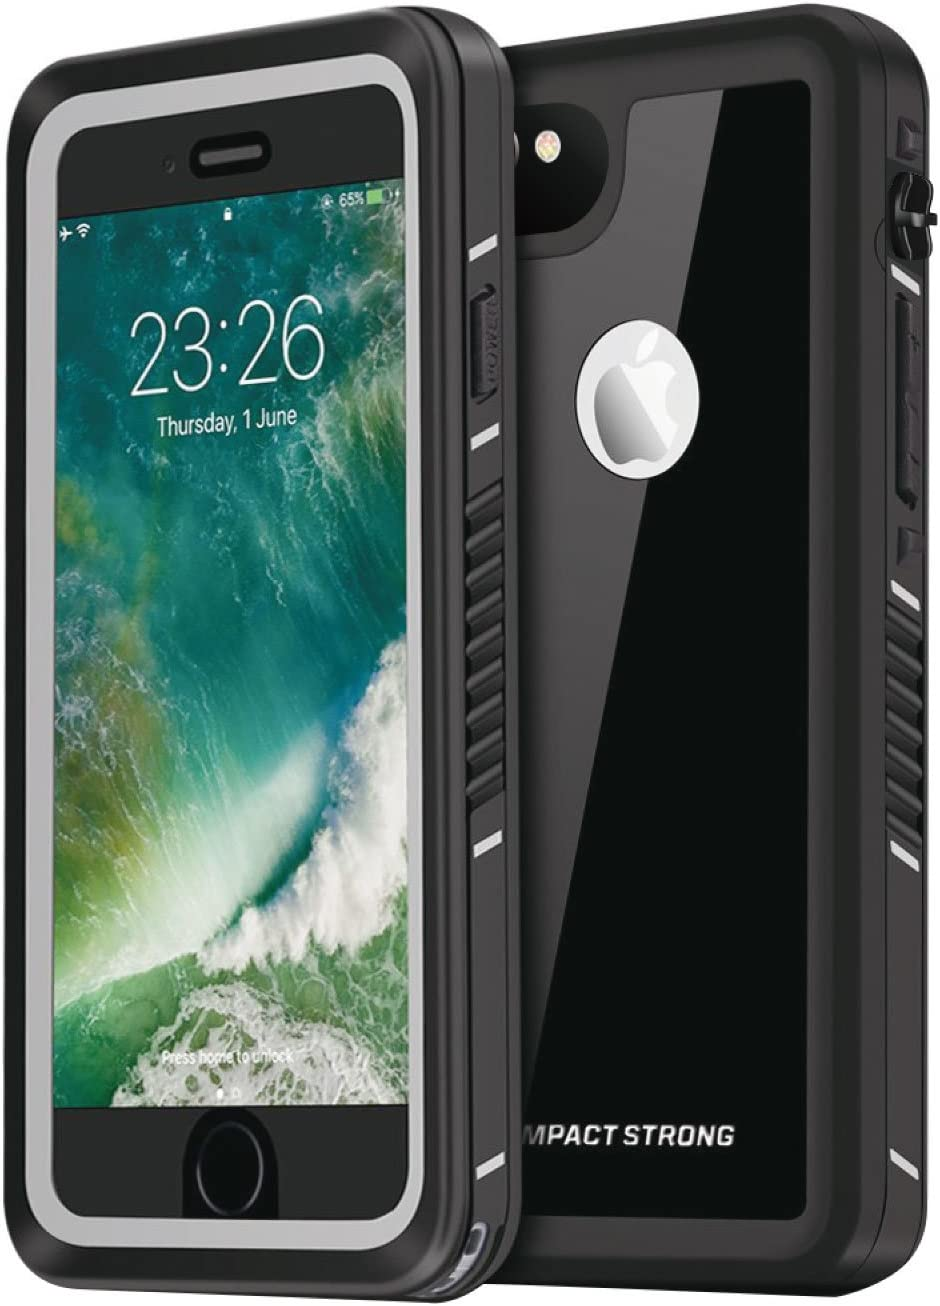 "IMPACTSTRONG iPhone 6/6s Plus Case, Waterproof Case [Fingerprint ID Compatible] Slim Full Body Protection for Apple iPhone 6 Plus & 6s Plus (5.5"") - FS Jet Black"